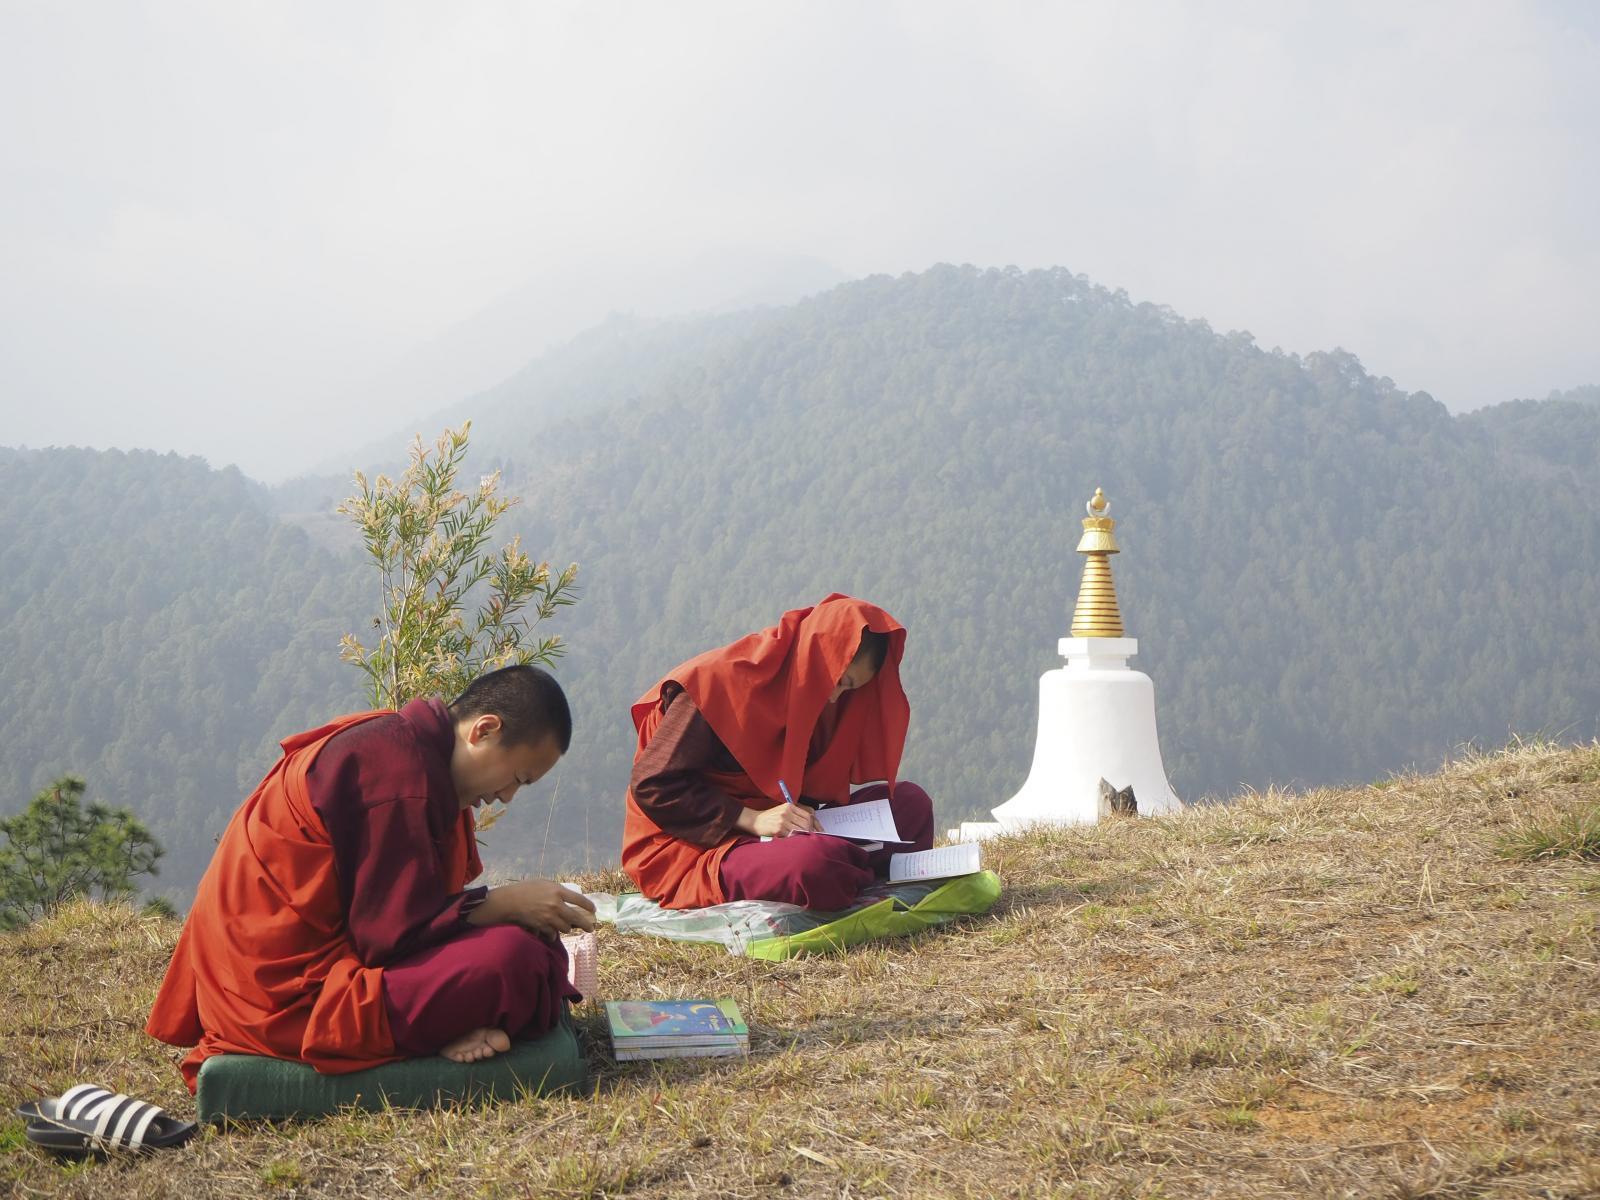 Thimpu, Bhutan. Sangay Thinley Tenzing